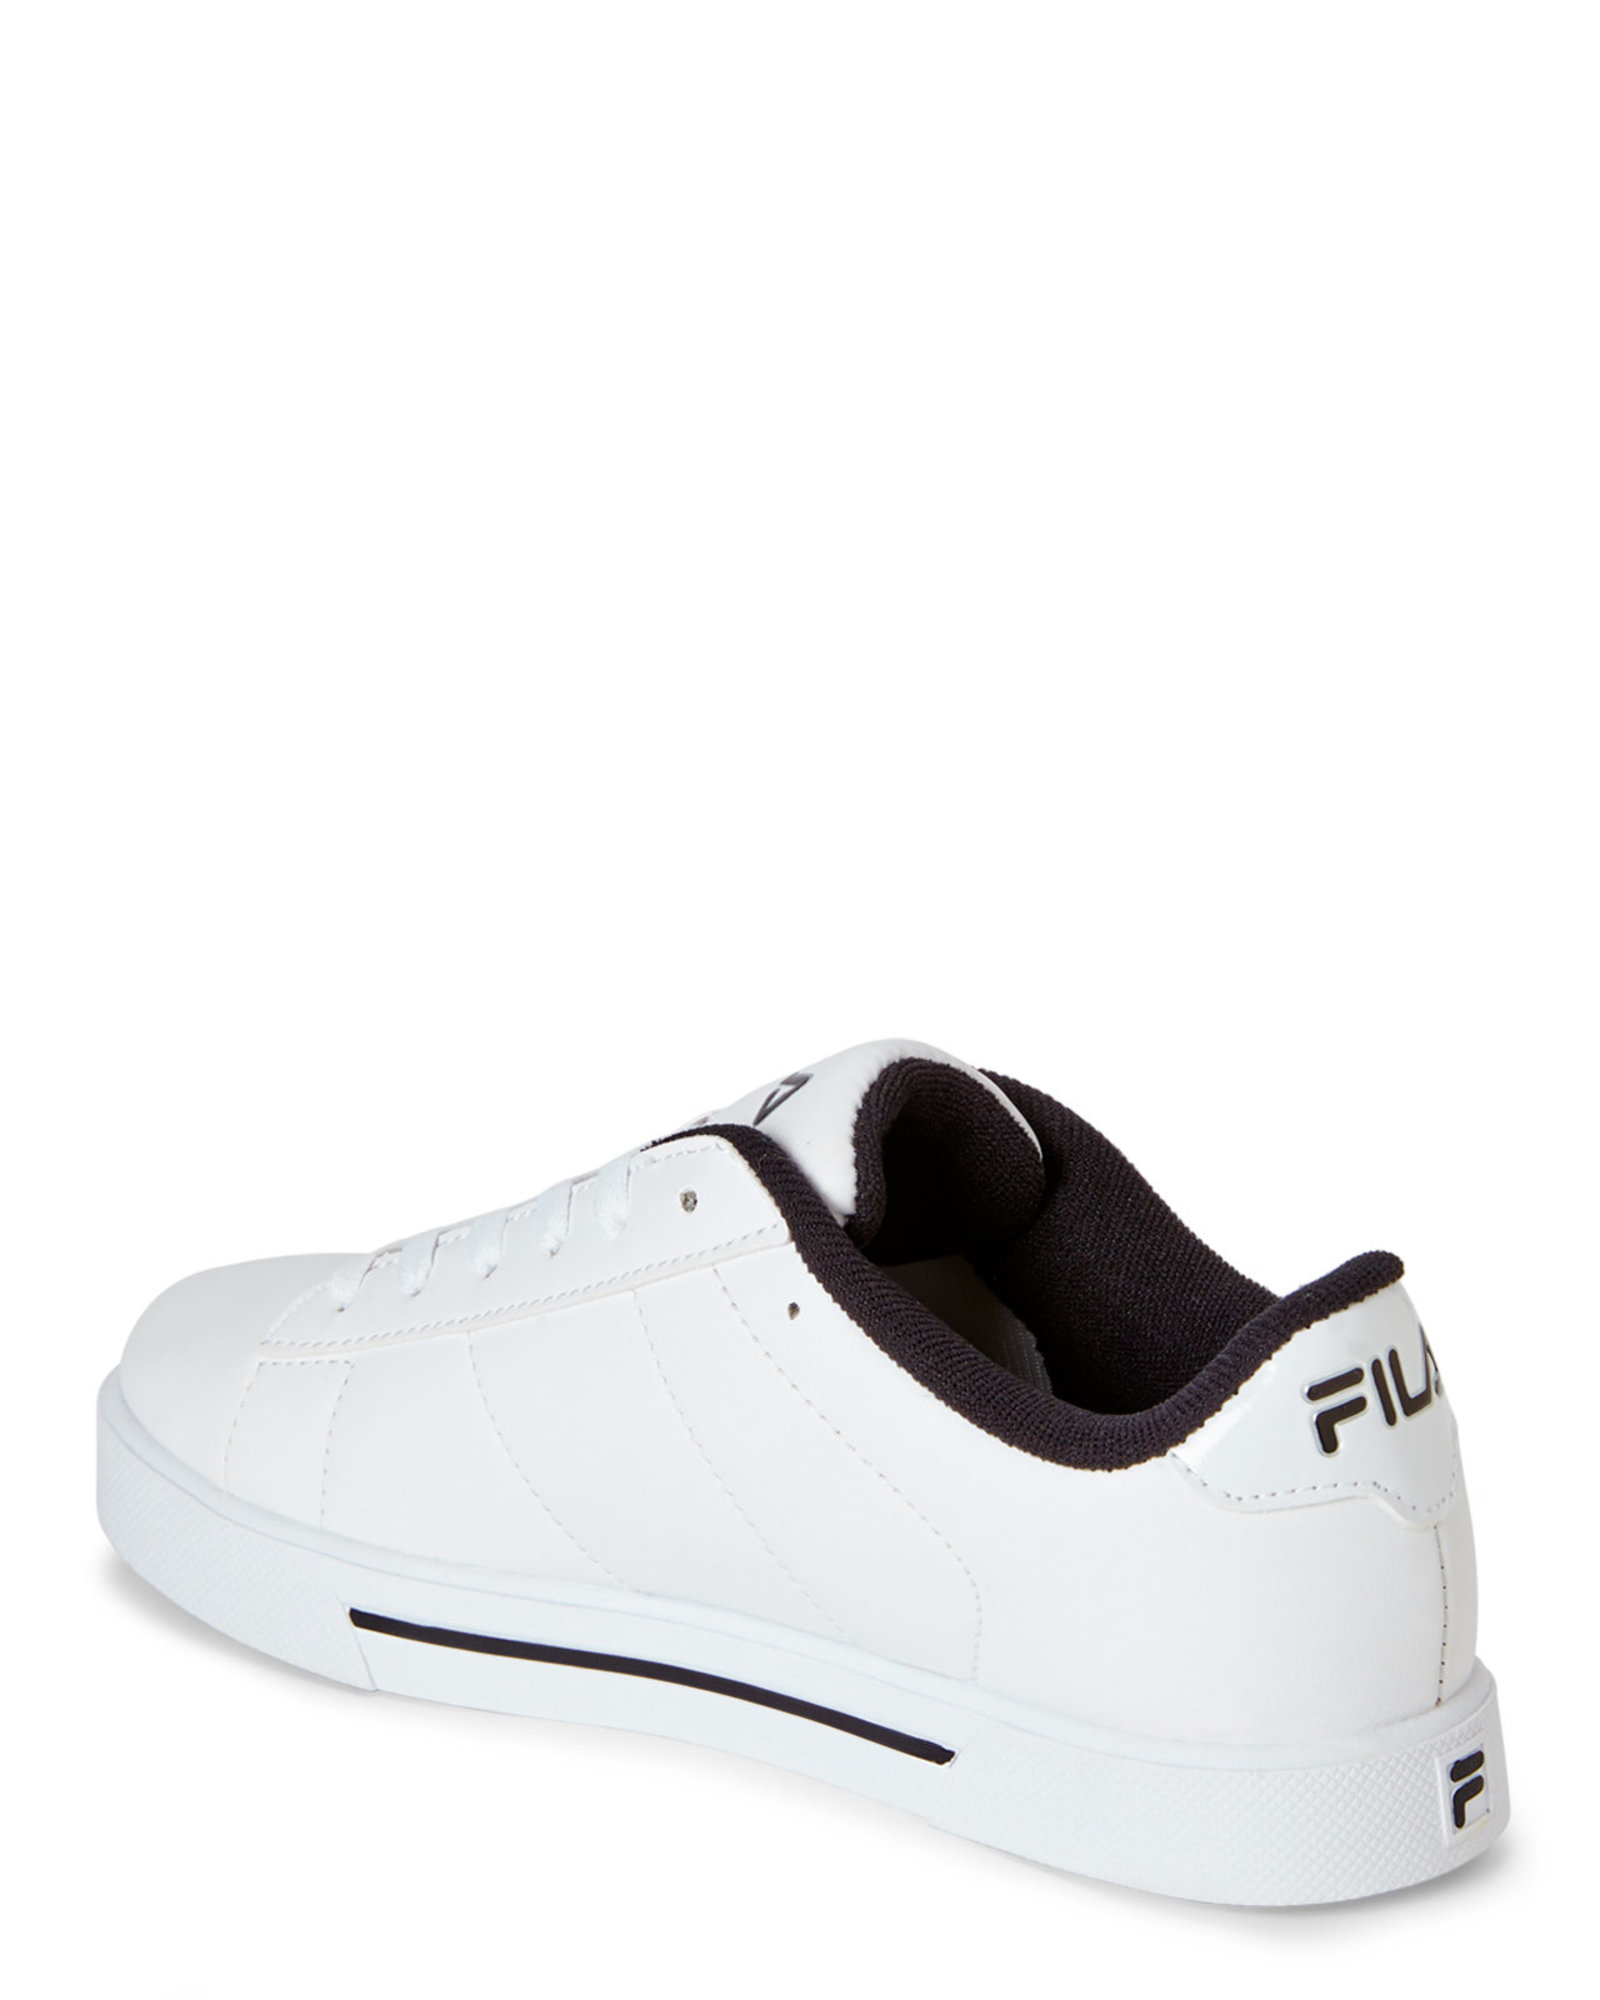 873b8fc88f39 Lyst - Fila White   Black Benefactor Sneakers in White